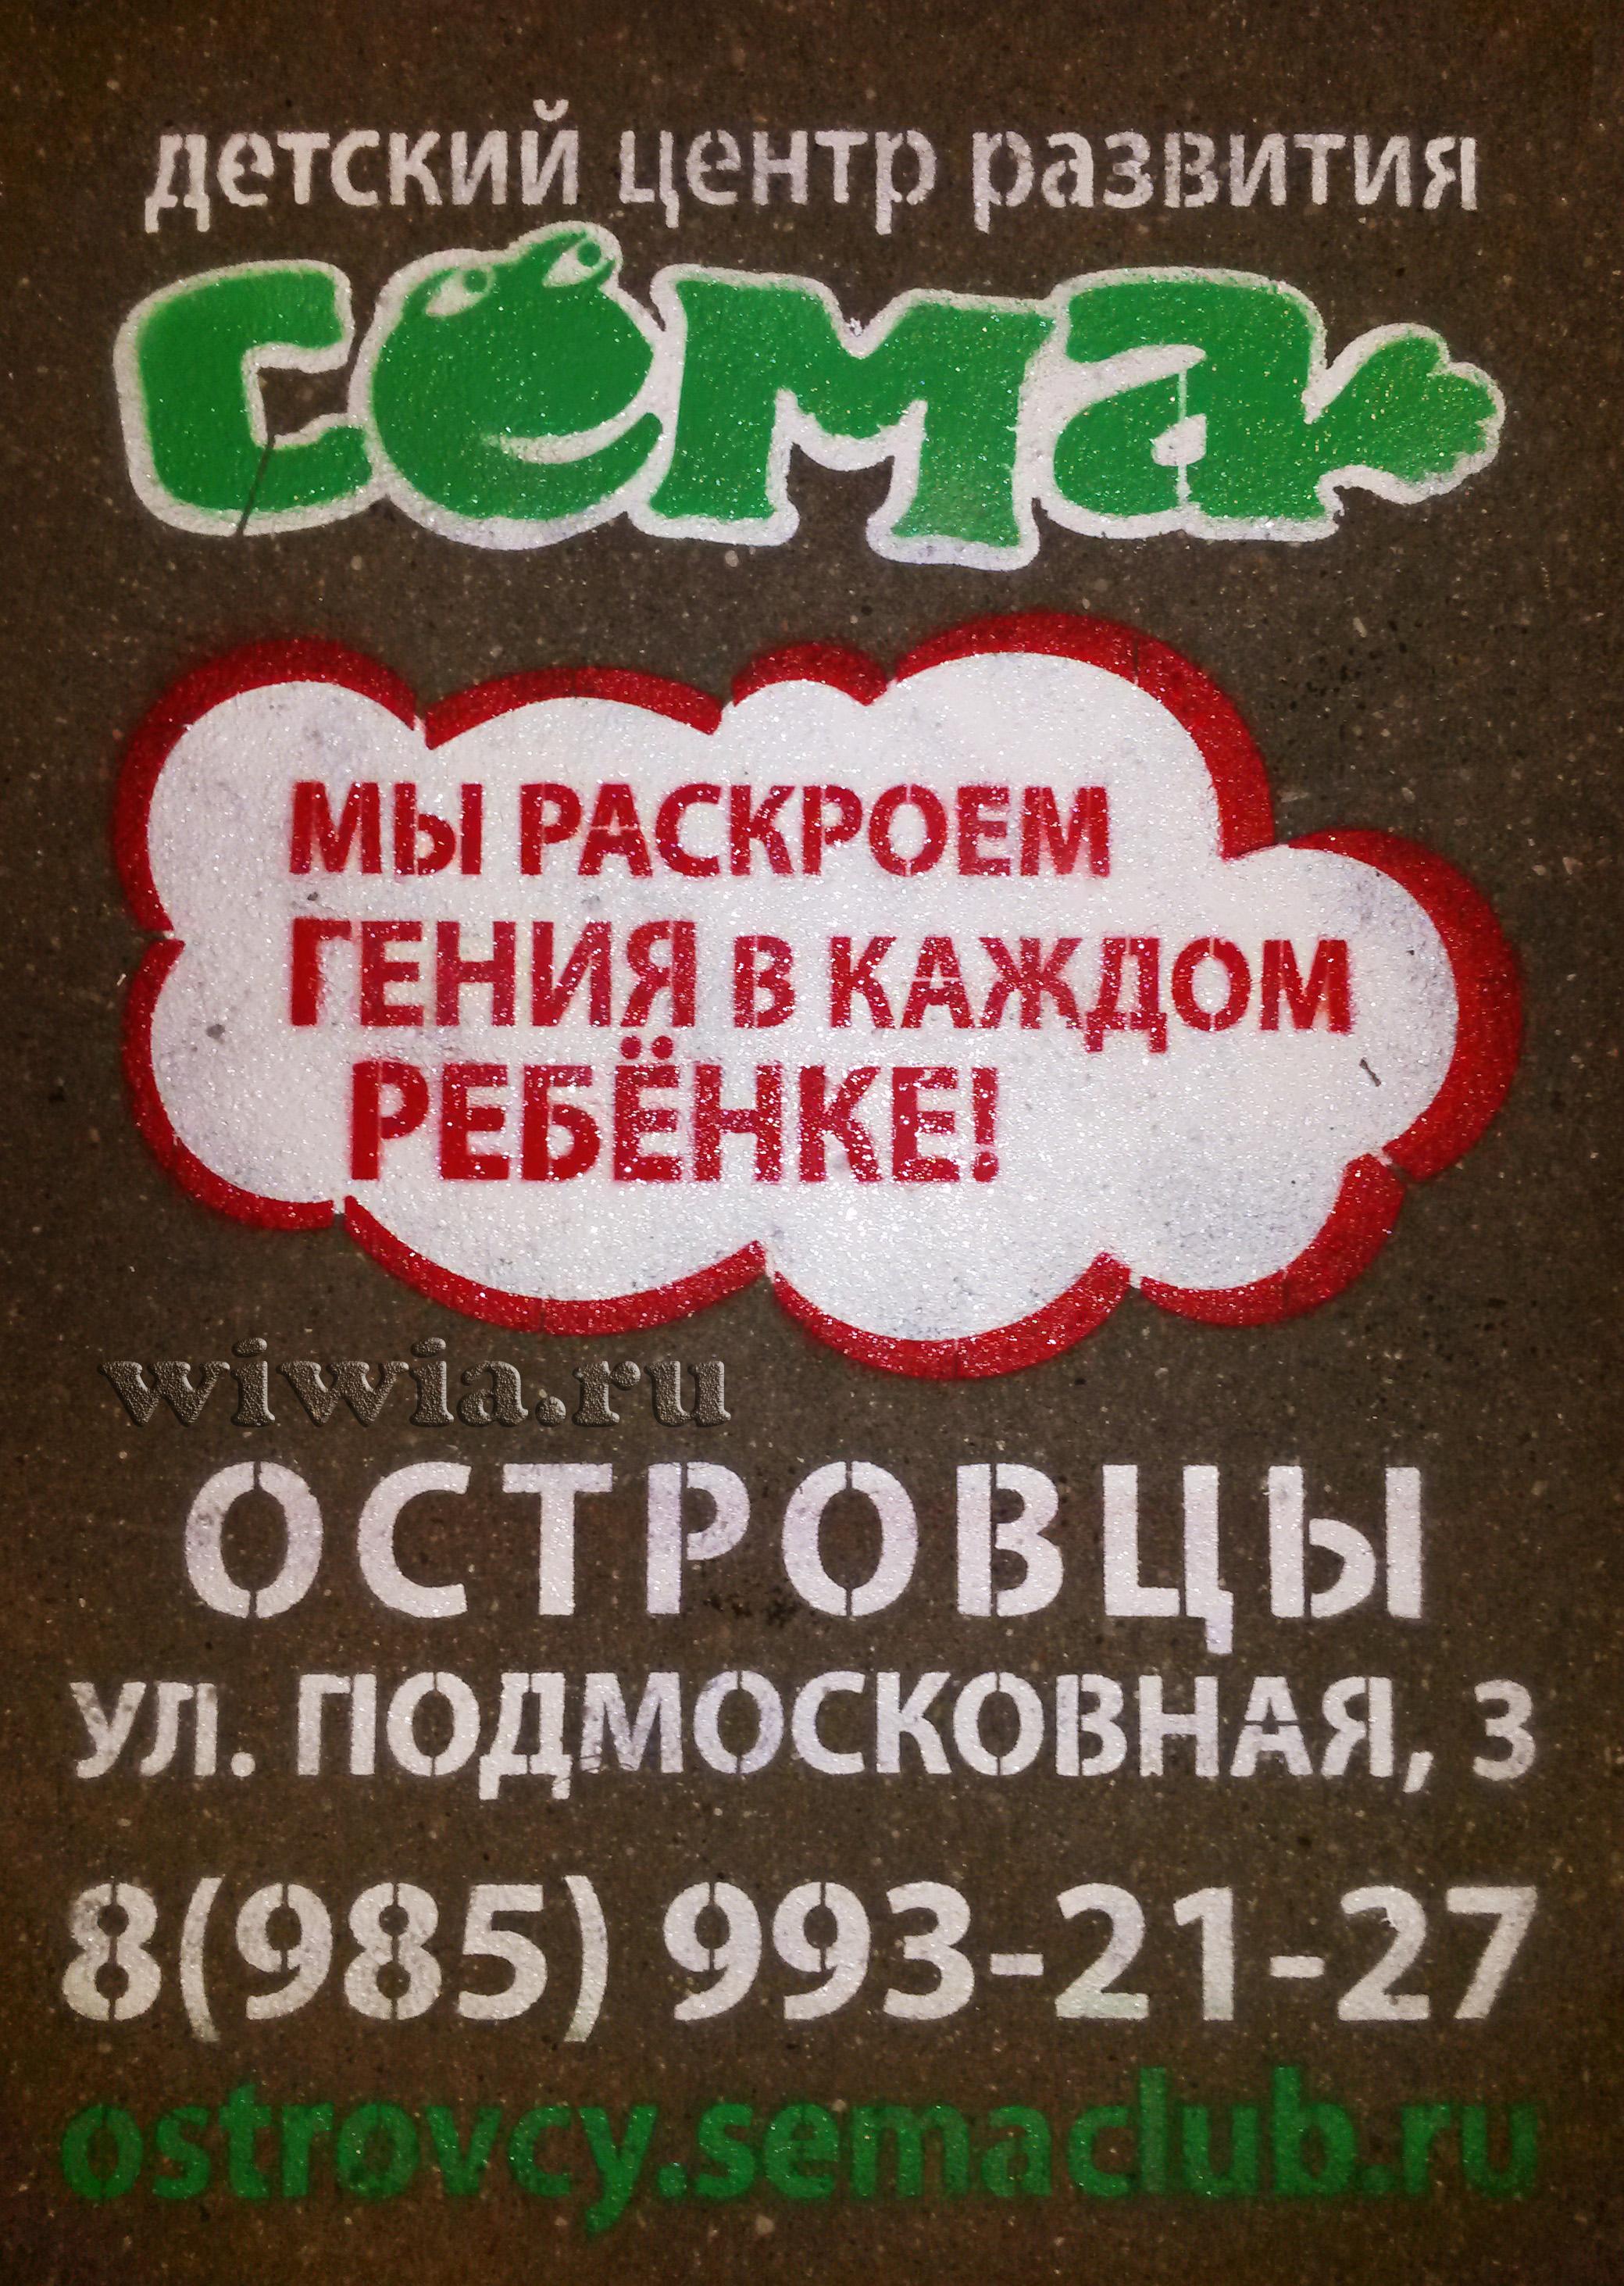 Реклама на асфальте в МО.